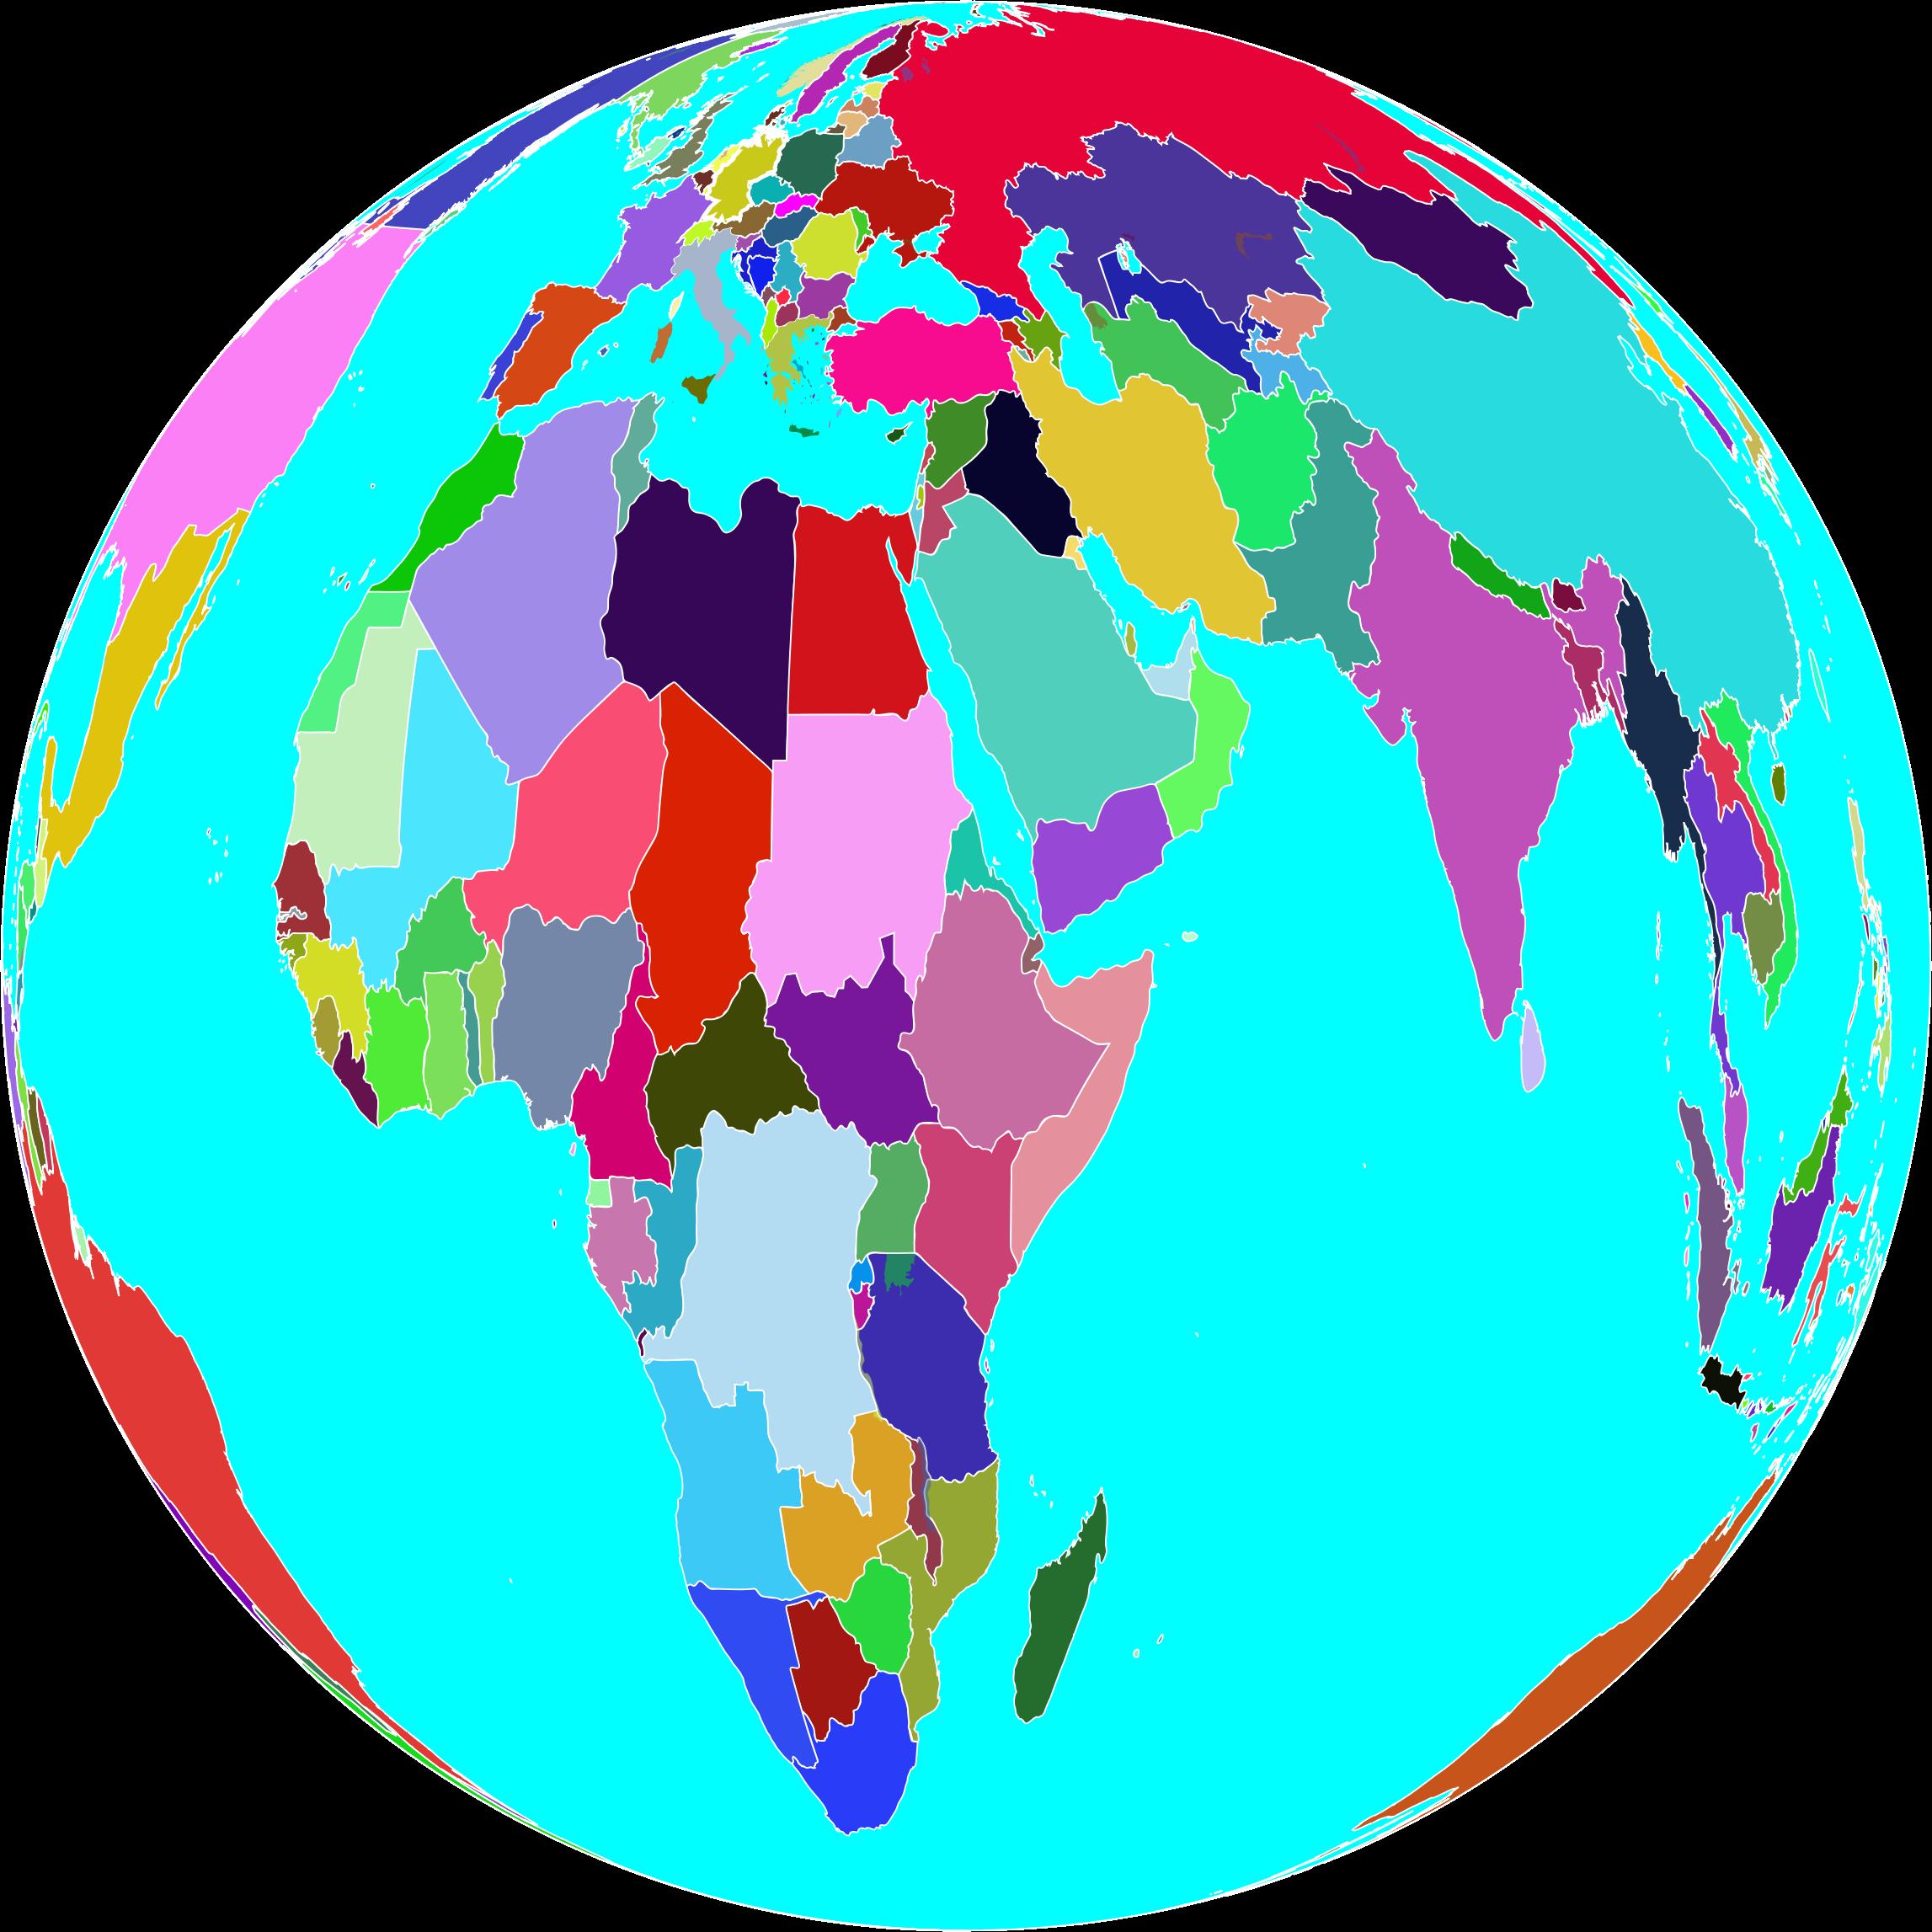 Clipart world globle. Colorful globe